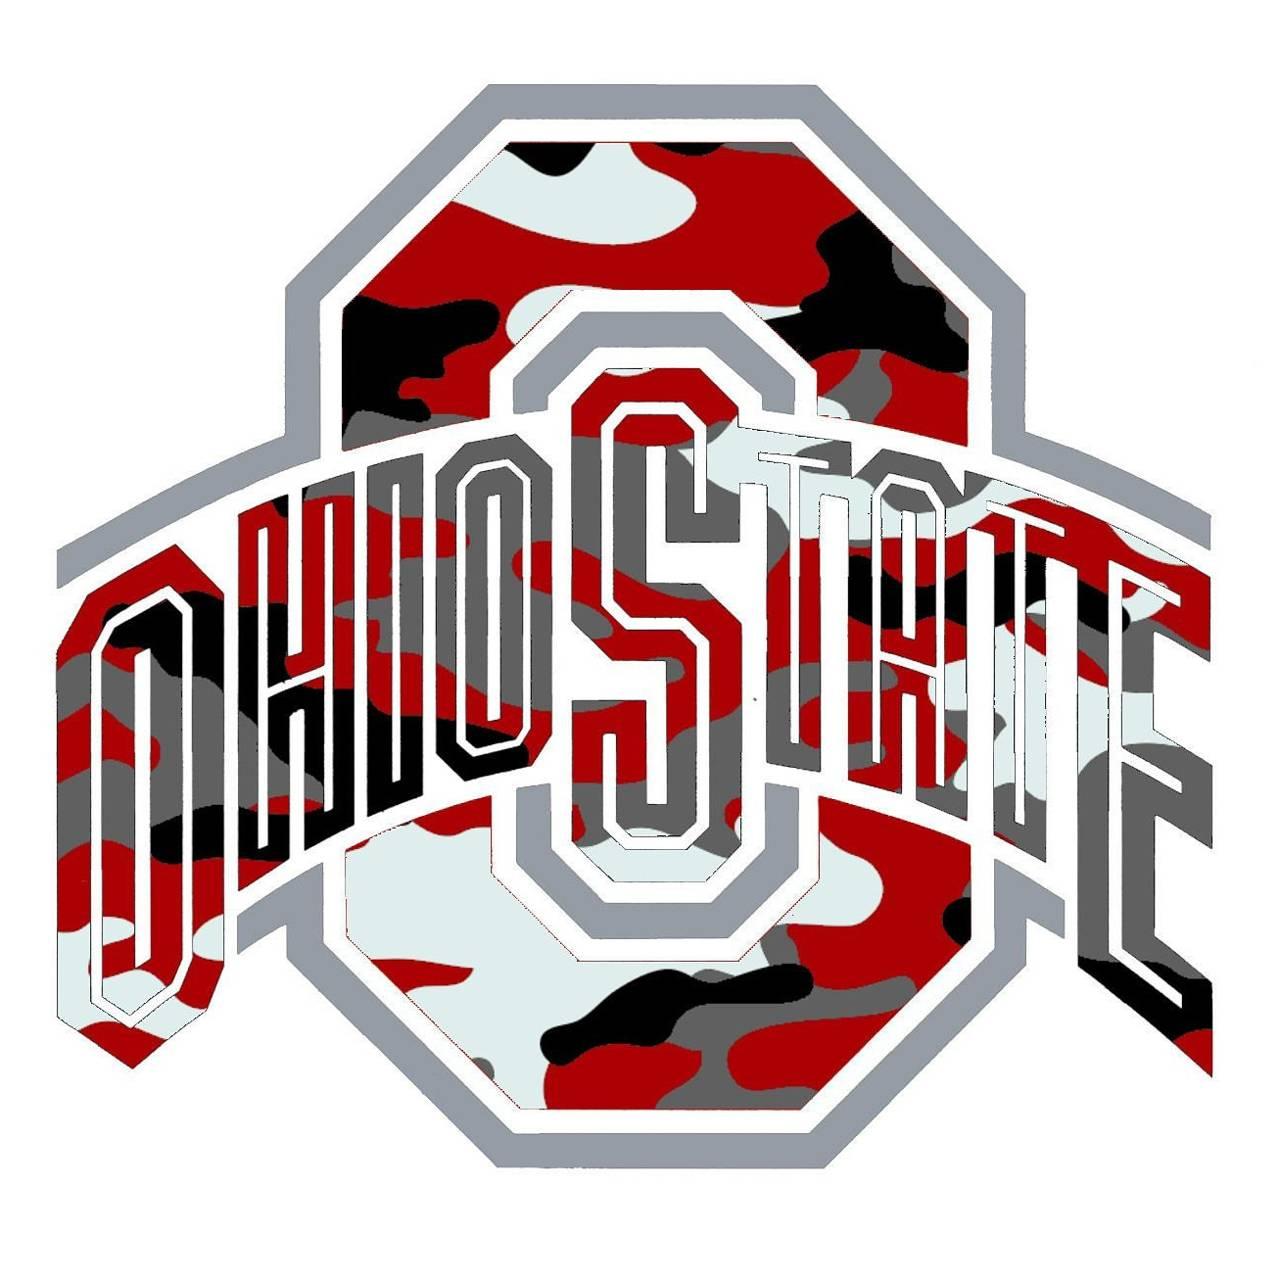 Ohio State camp logo